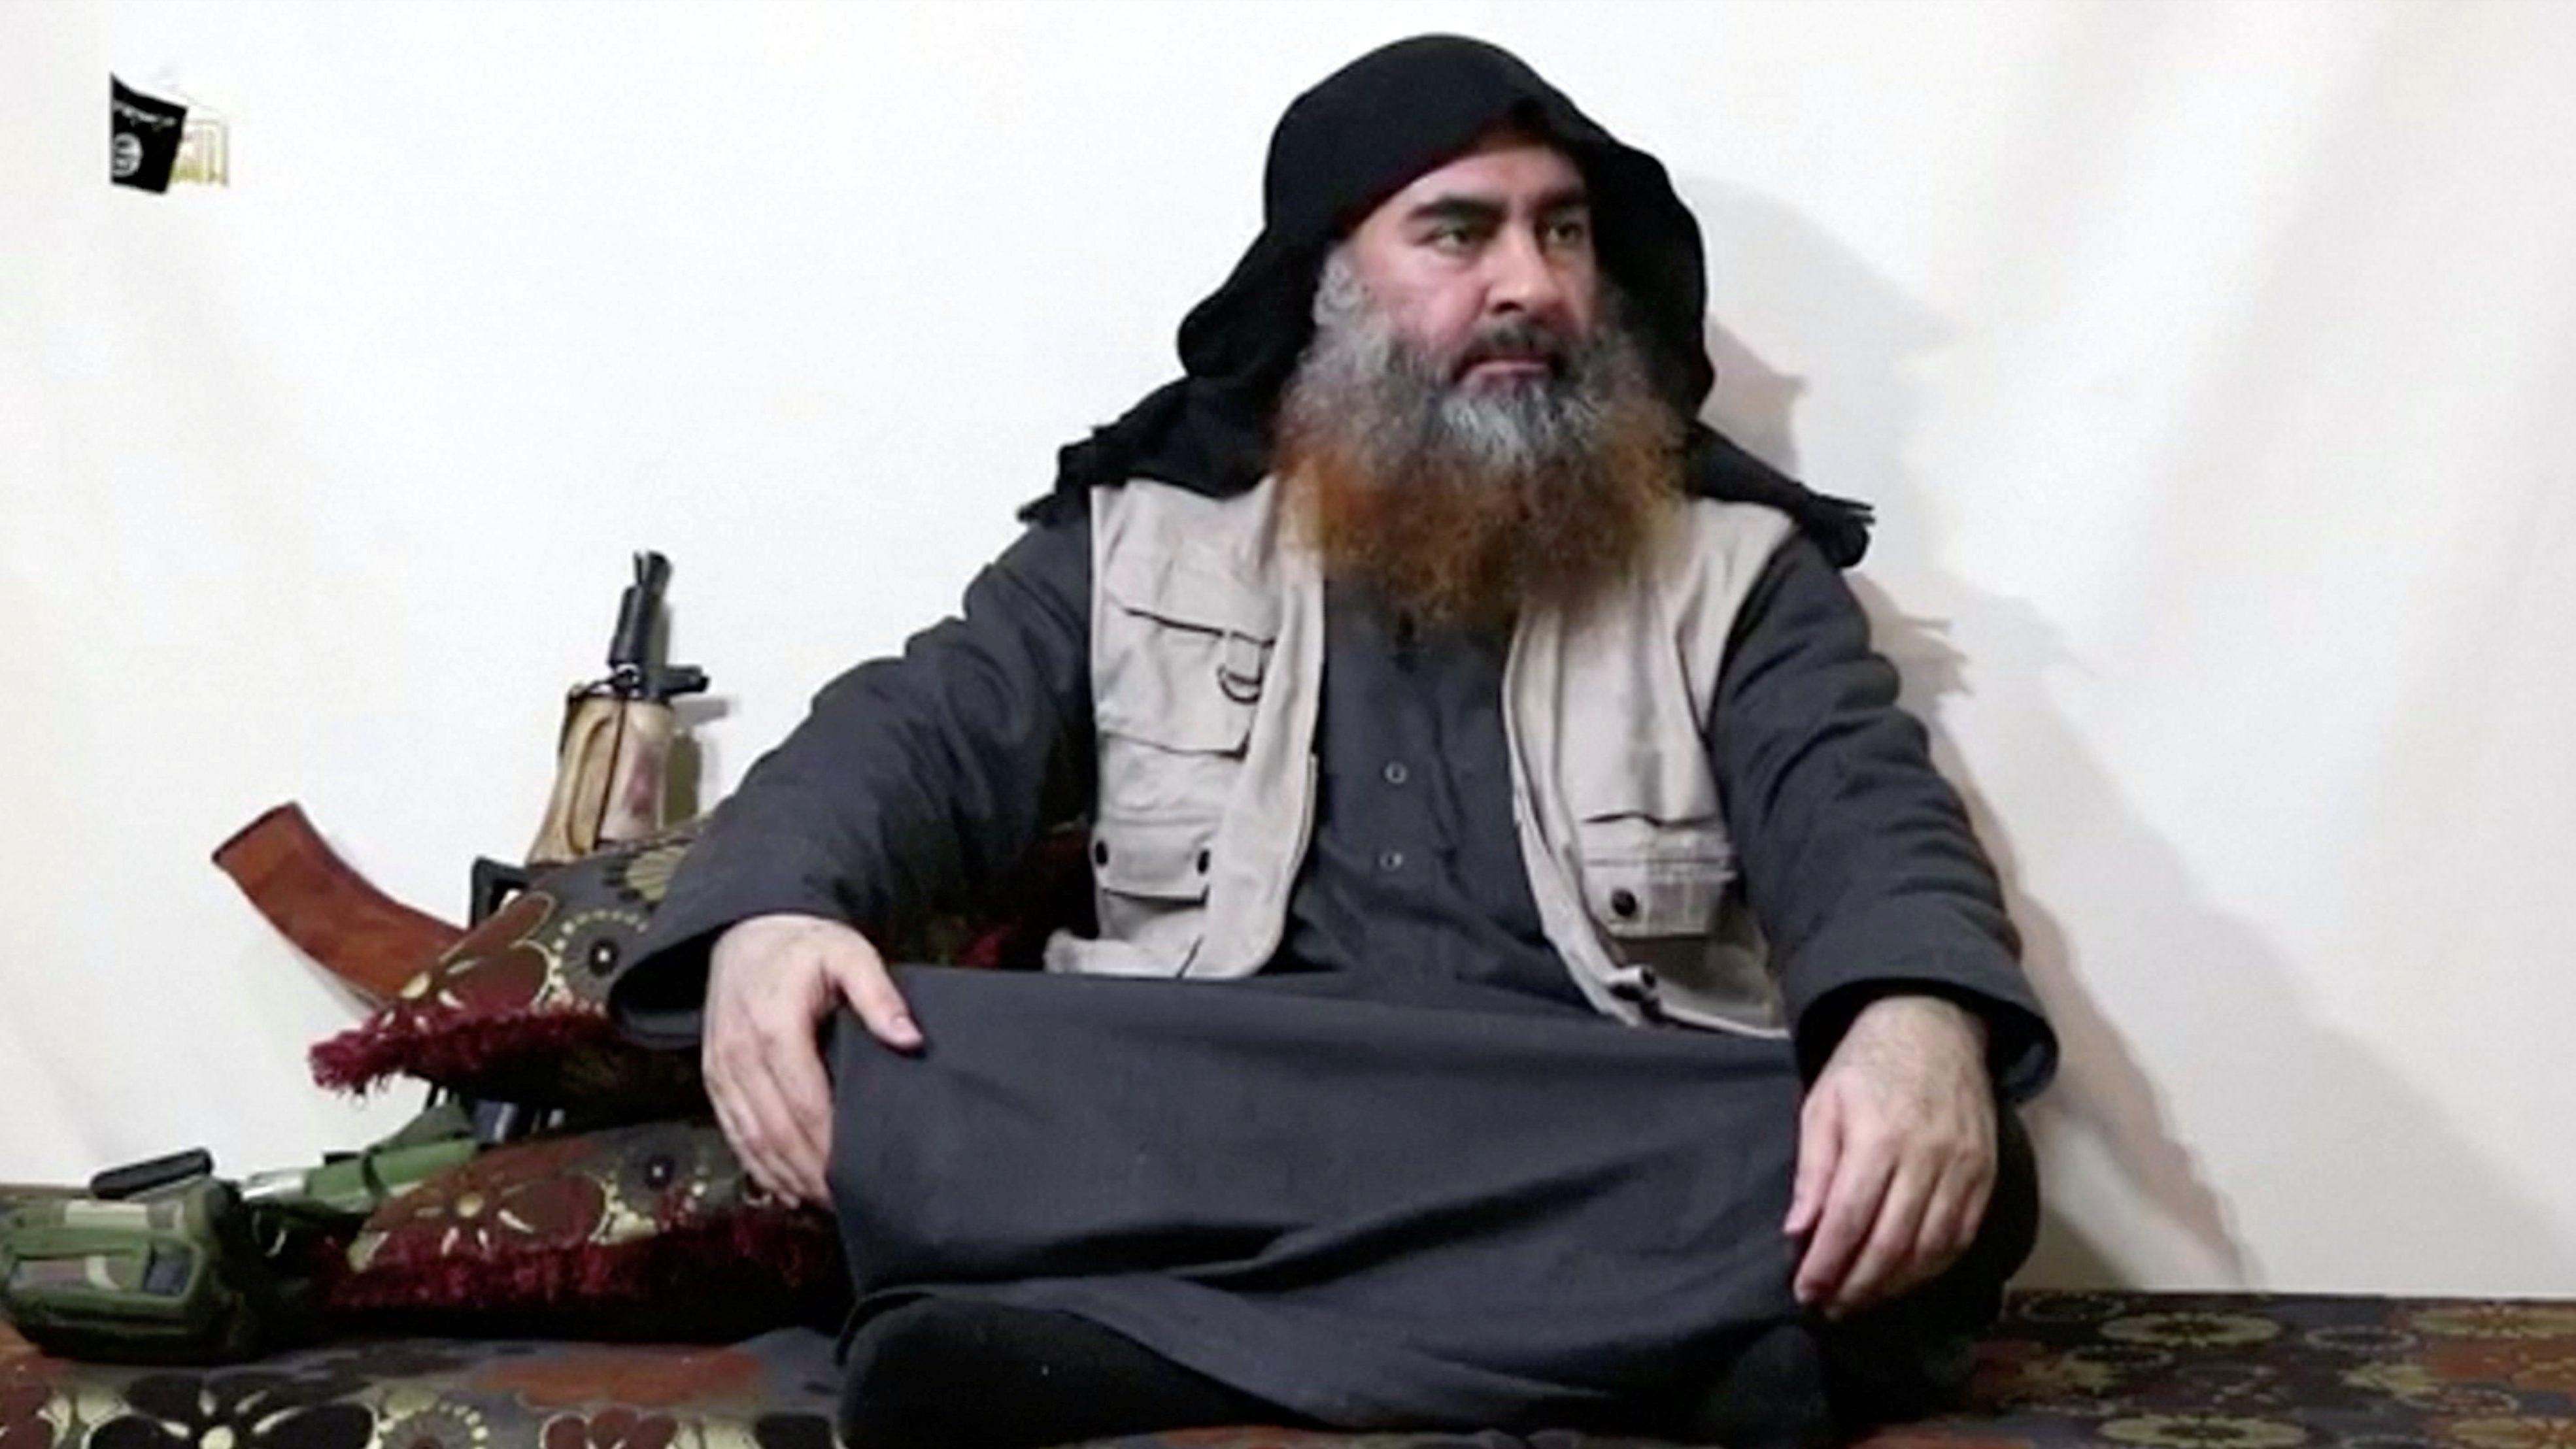 Photo of ISIS leader Abu Bakr al-Baghdadi in a rare appearance. He is sitting crossed legged near a rifle.